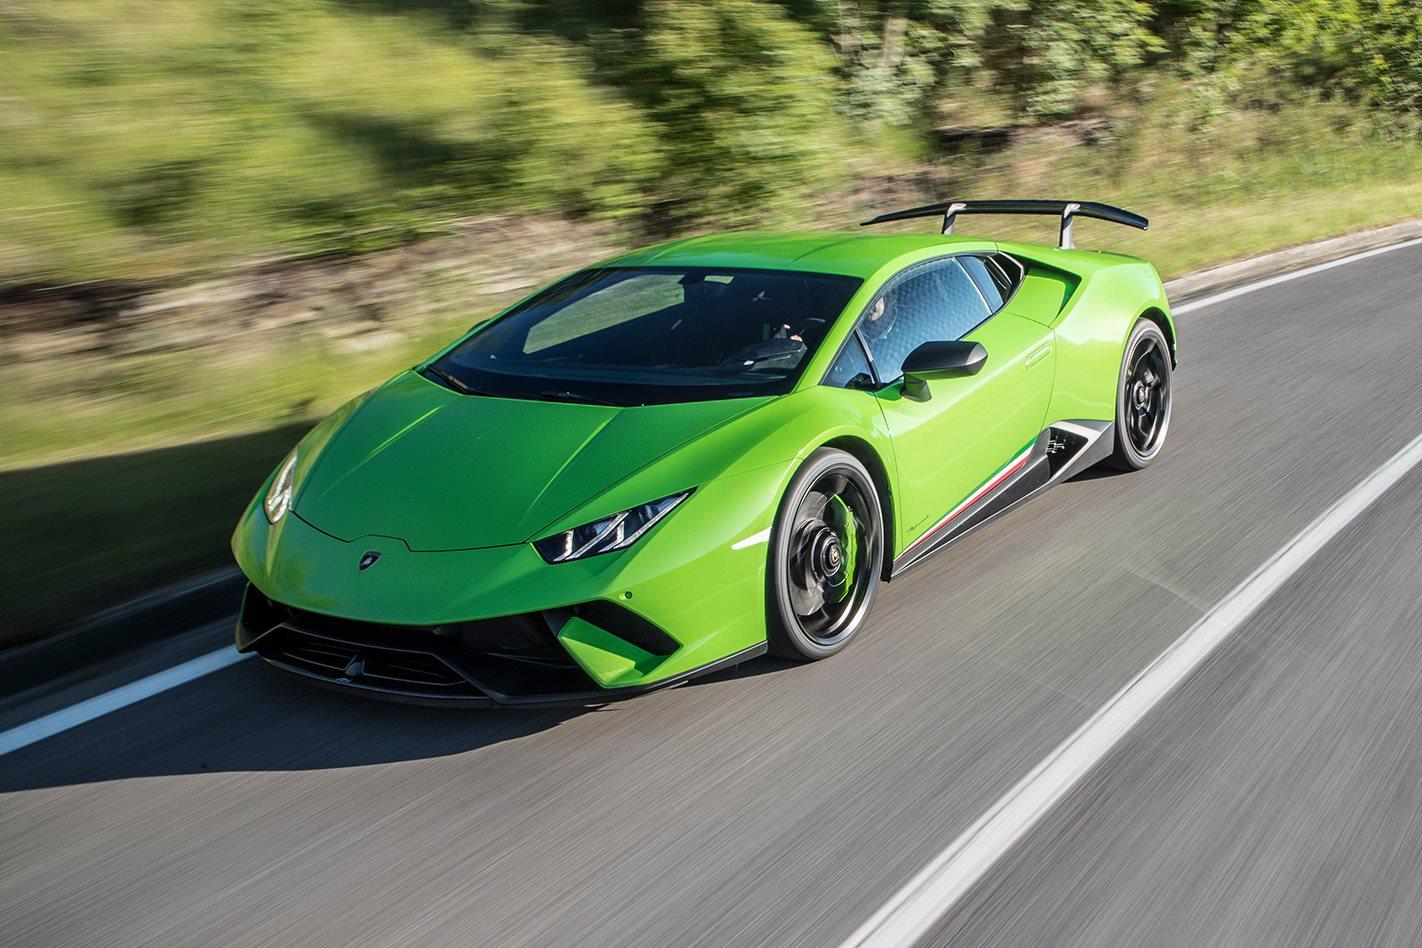 2017 Lamborghini Huracan Performante drive